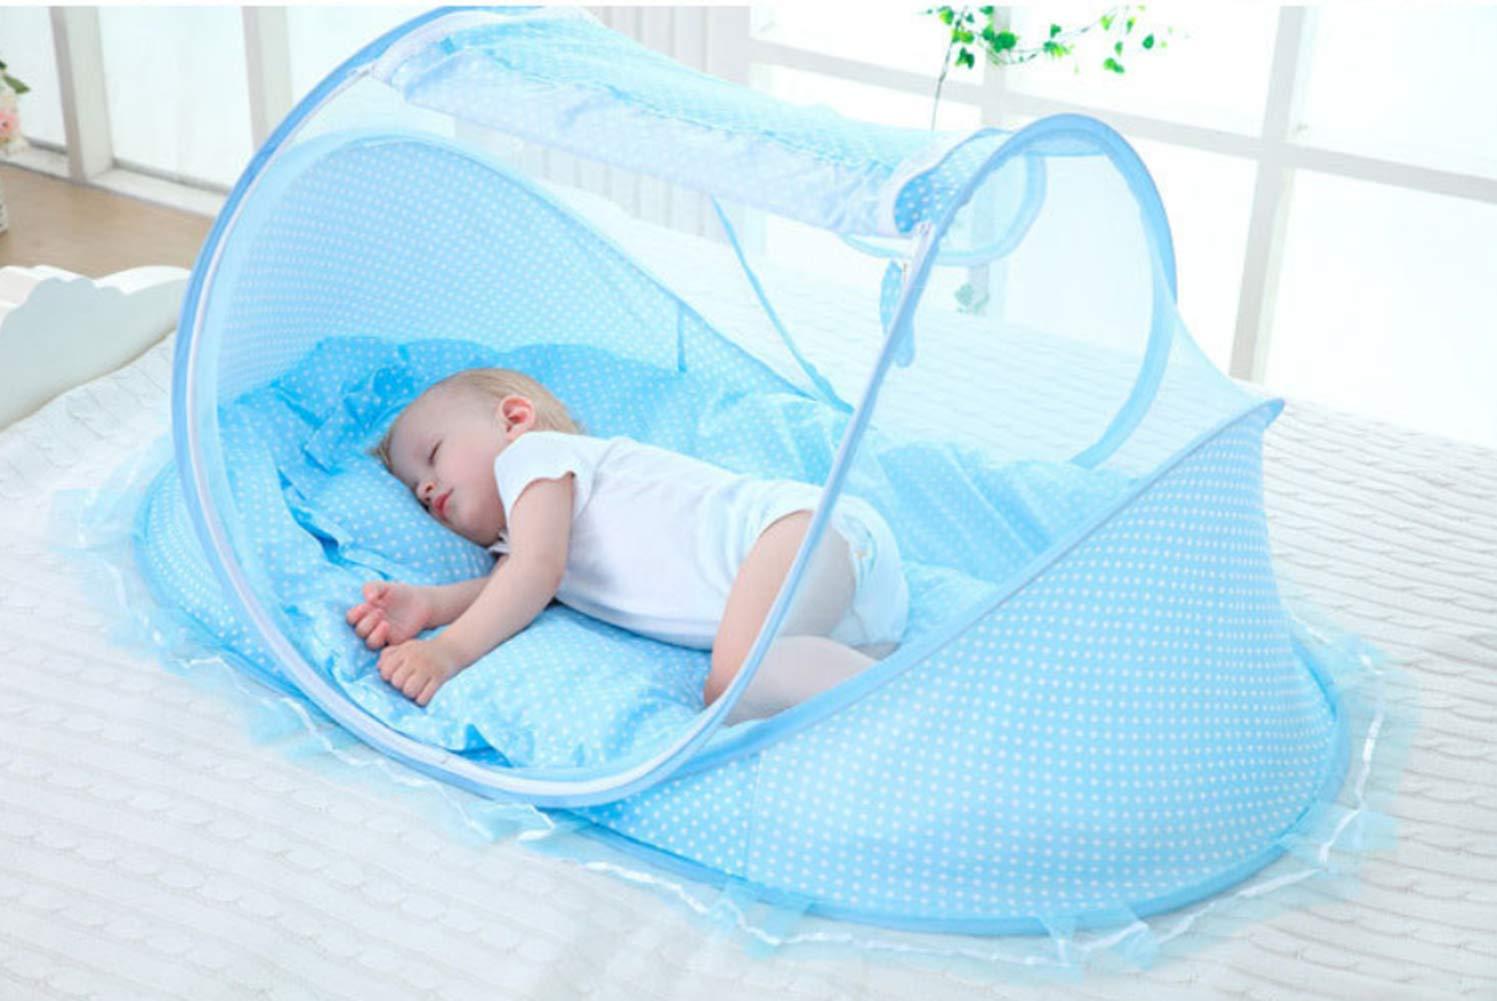 Babybett Neugeborenes faltbares Moskitonetz mit Kissen Baby-Reisebett tragbares klappbares Babybett